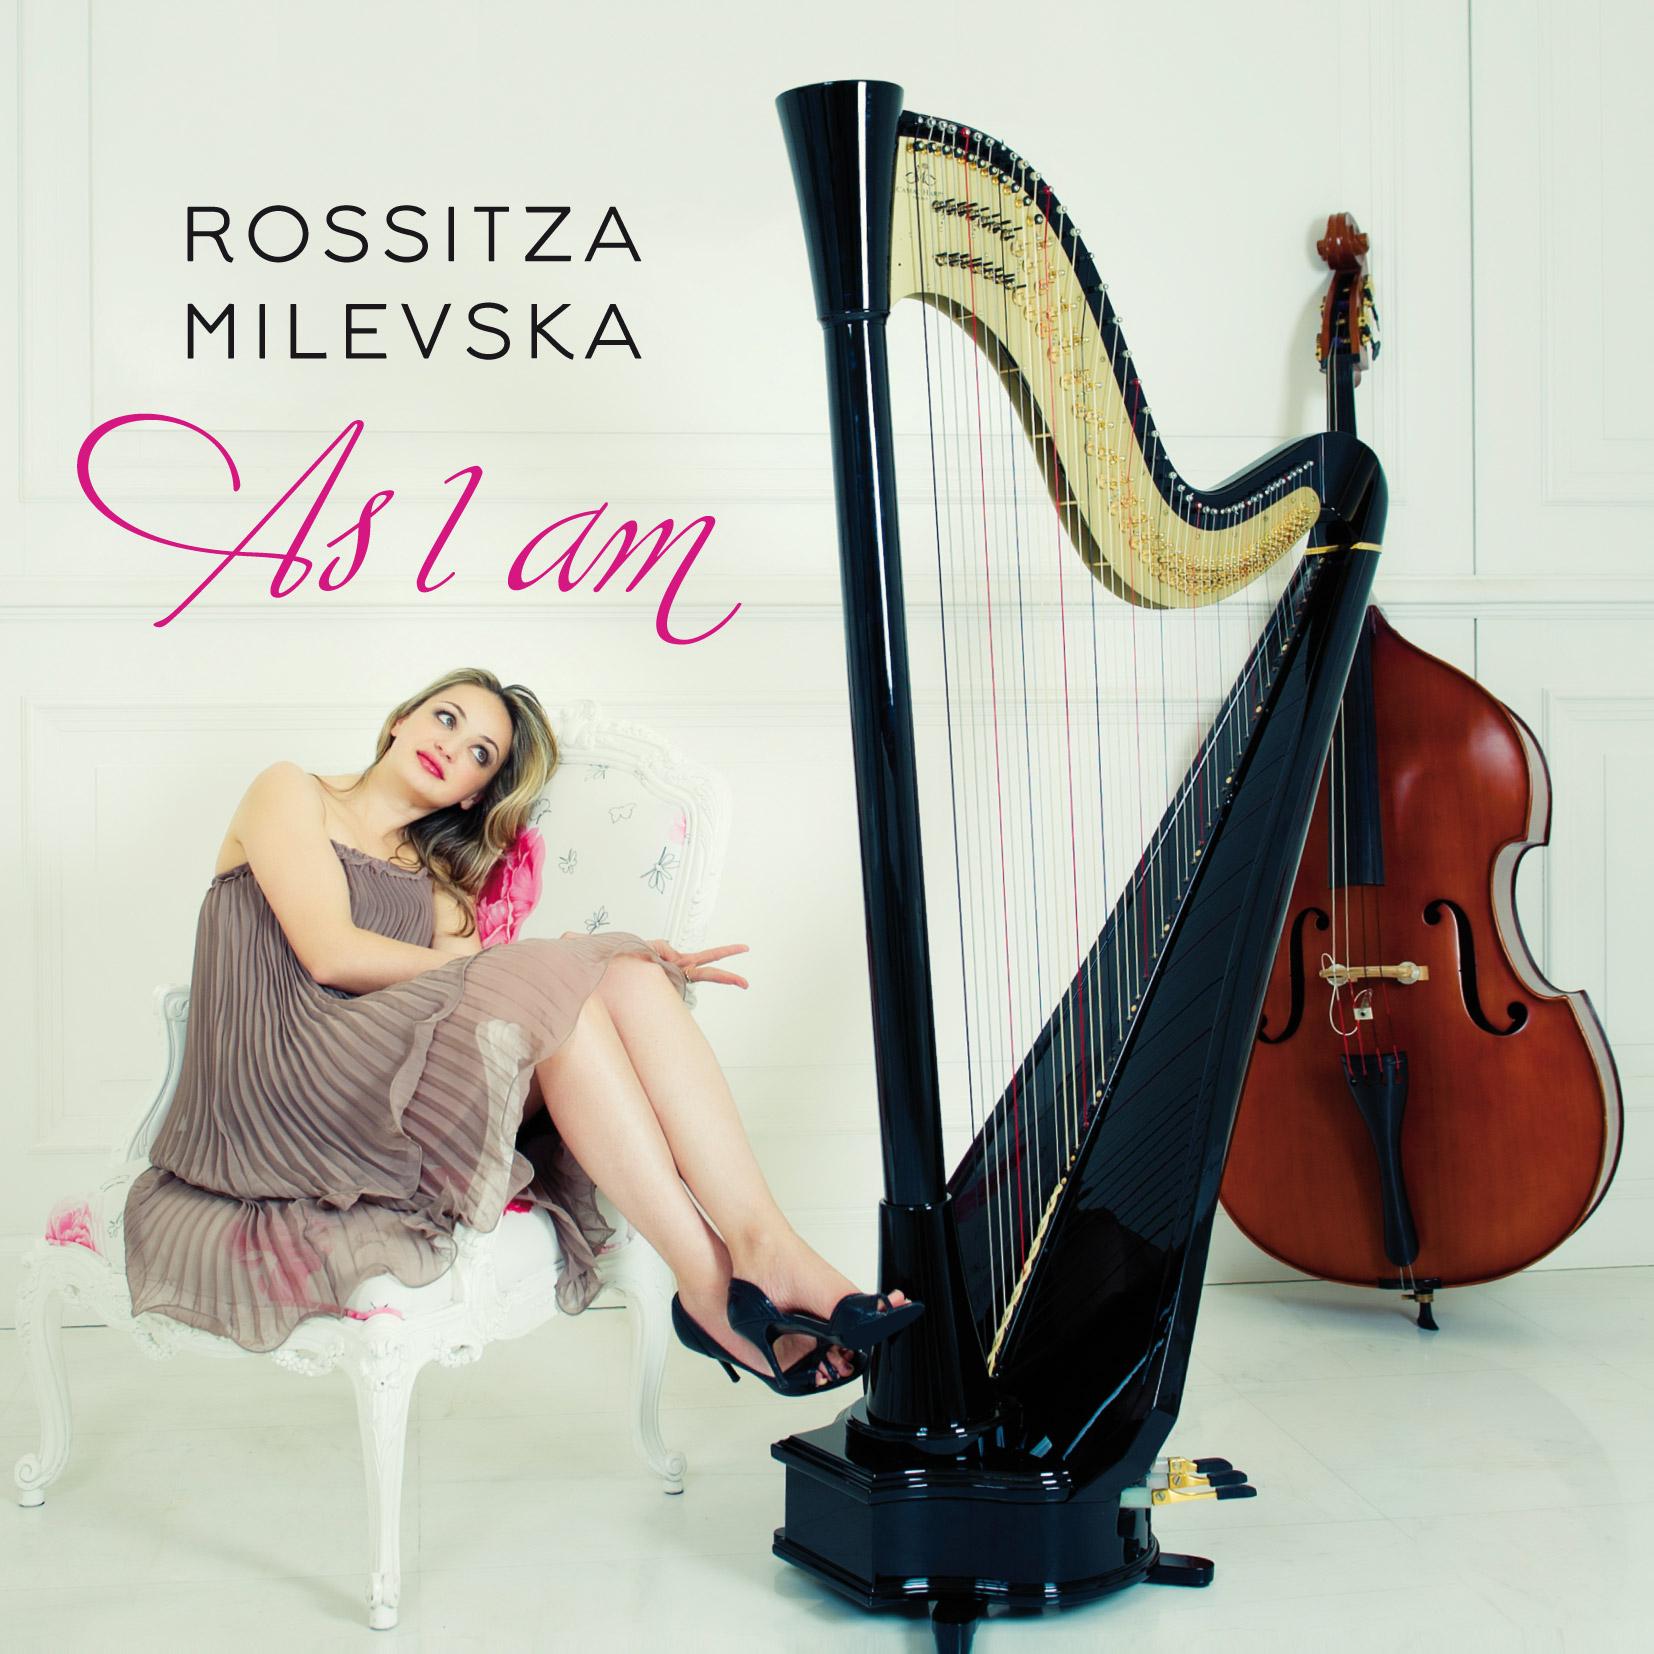 as I am, album by rossitza milevska, harpist composer singer